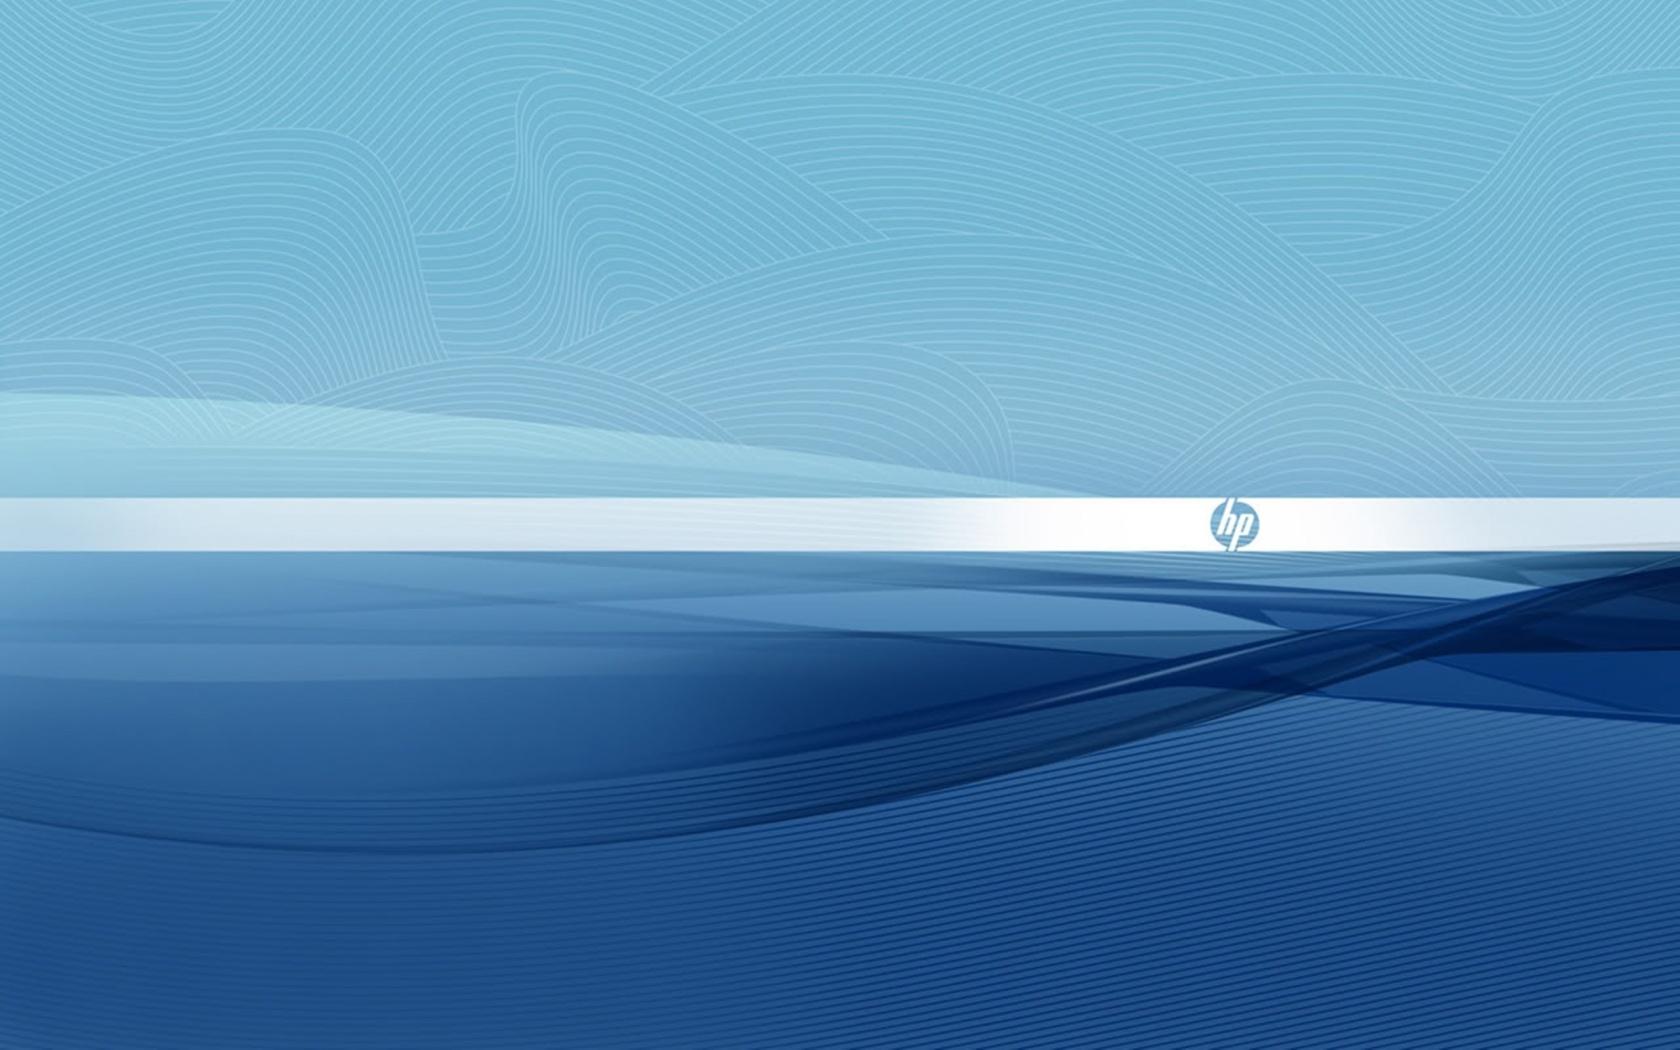 hp wallpapers download Desktop Backgrounds for HD Wallpaper 1680x1050